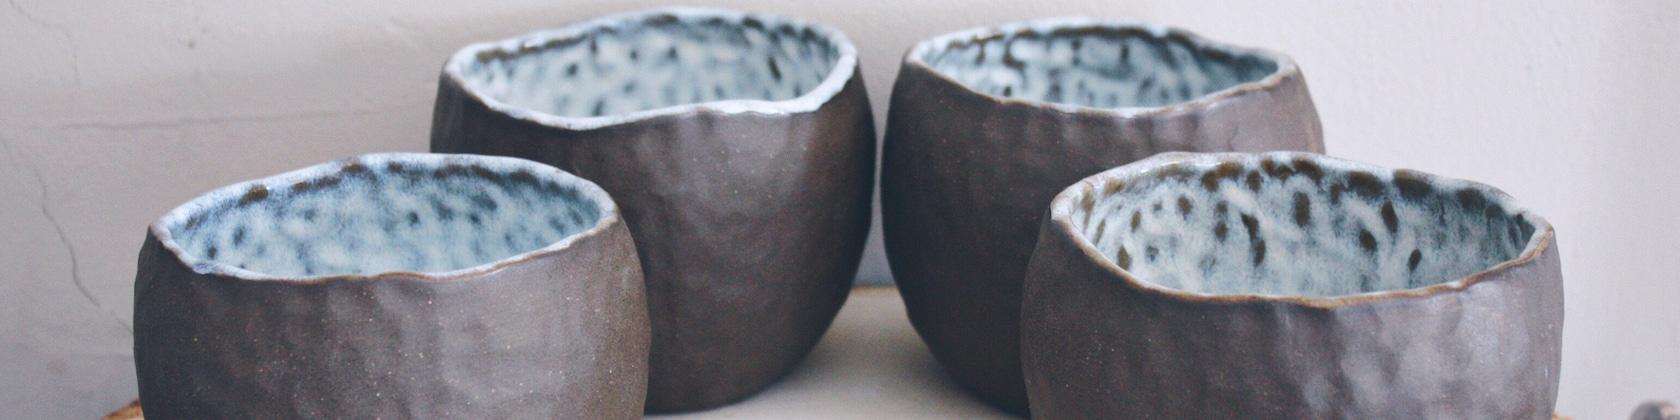 Small-batch handmade pottery & crocheted by MudandYarn on Etsy